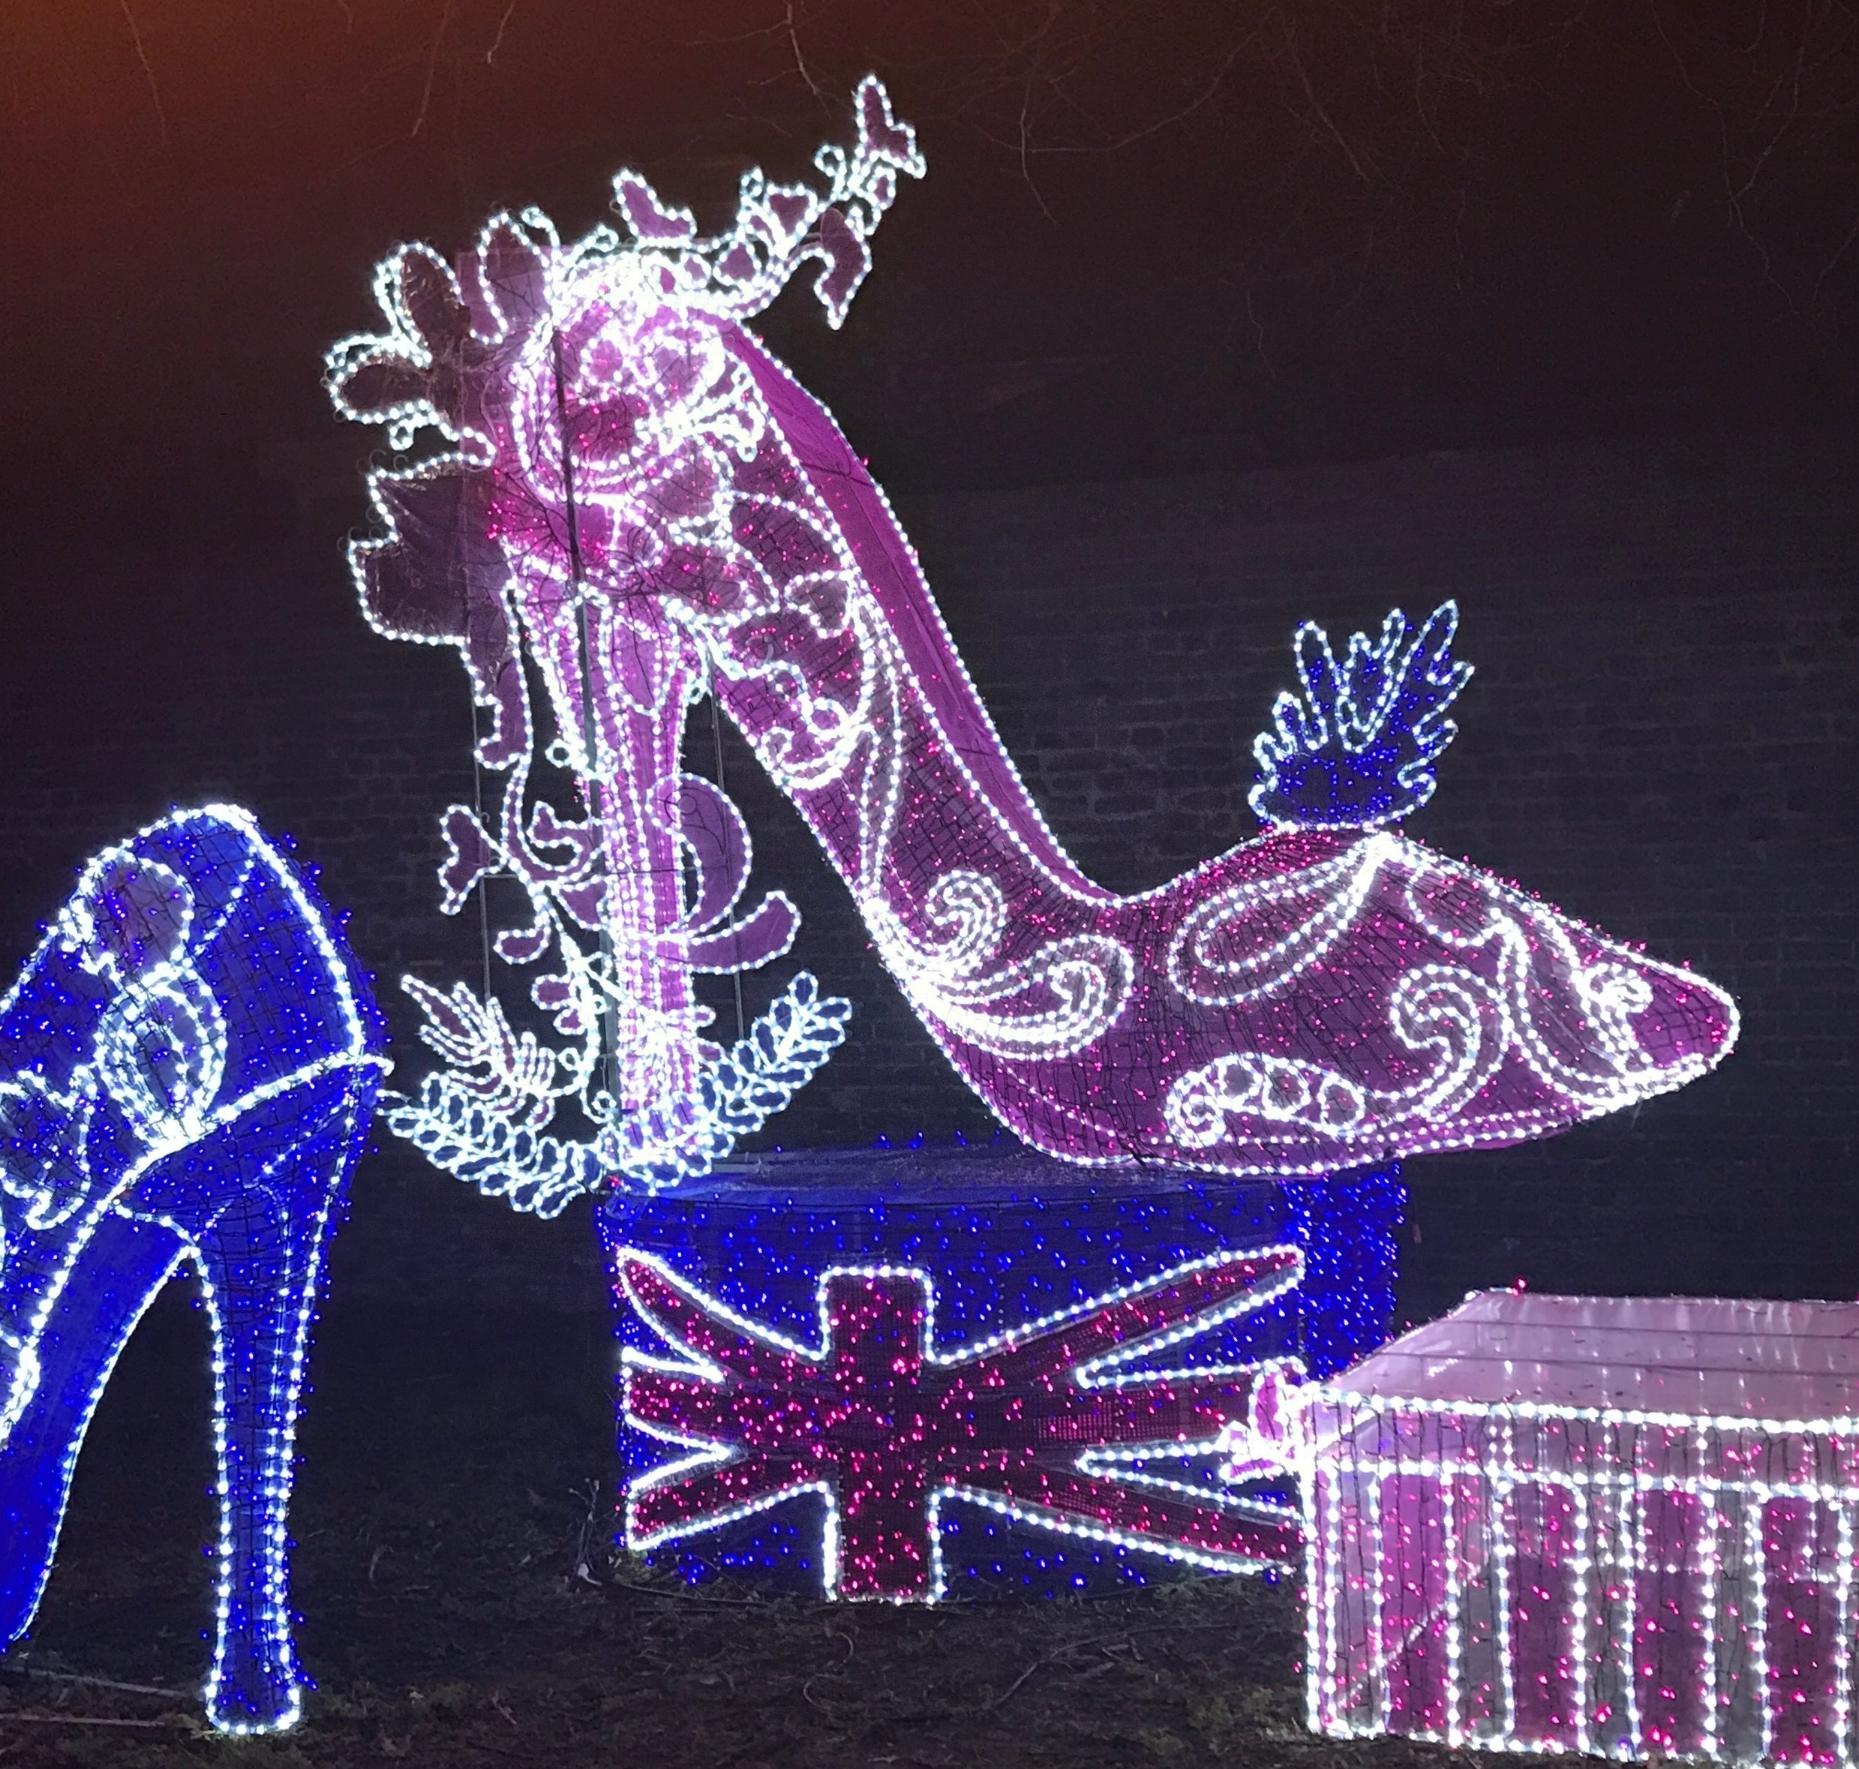 Celebrating Shoes and Fashion. Magical Lantern Festival. London 2017